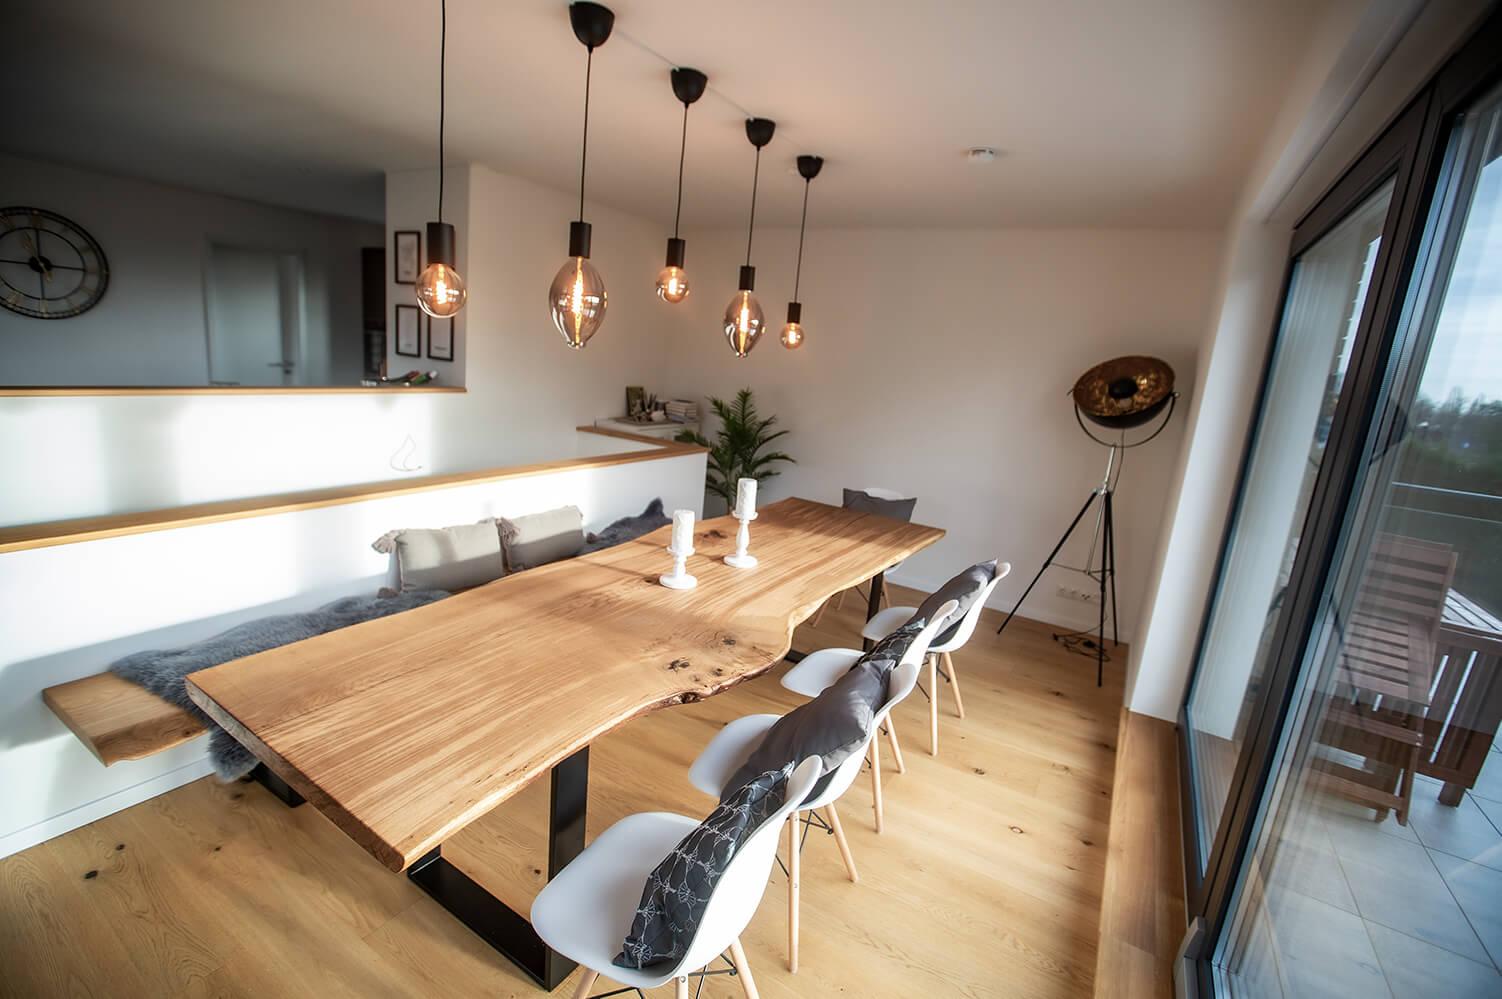 Designer Tisch, rustikal | Stammbohlen | Design Unikat